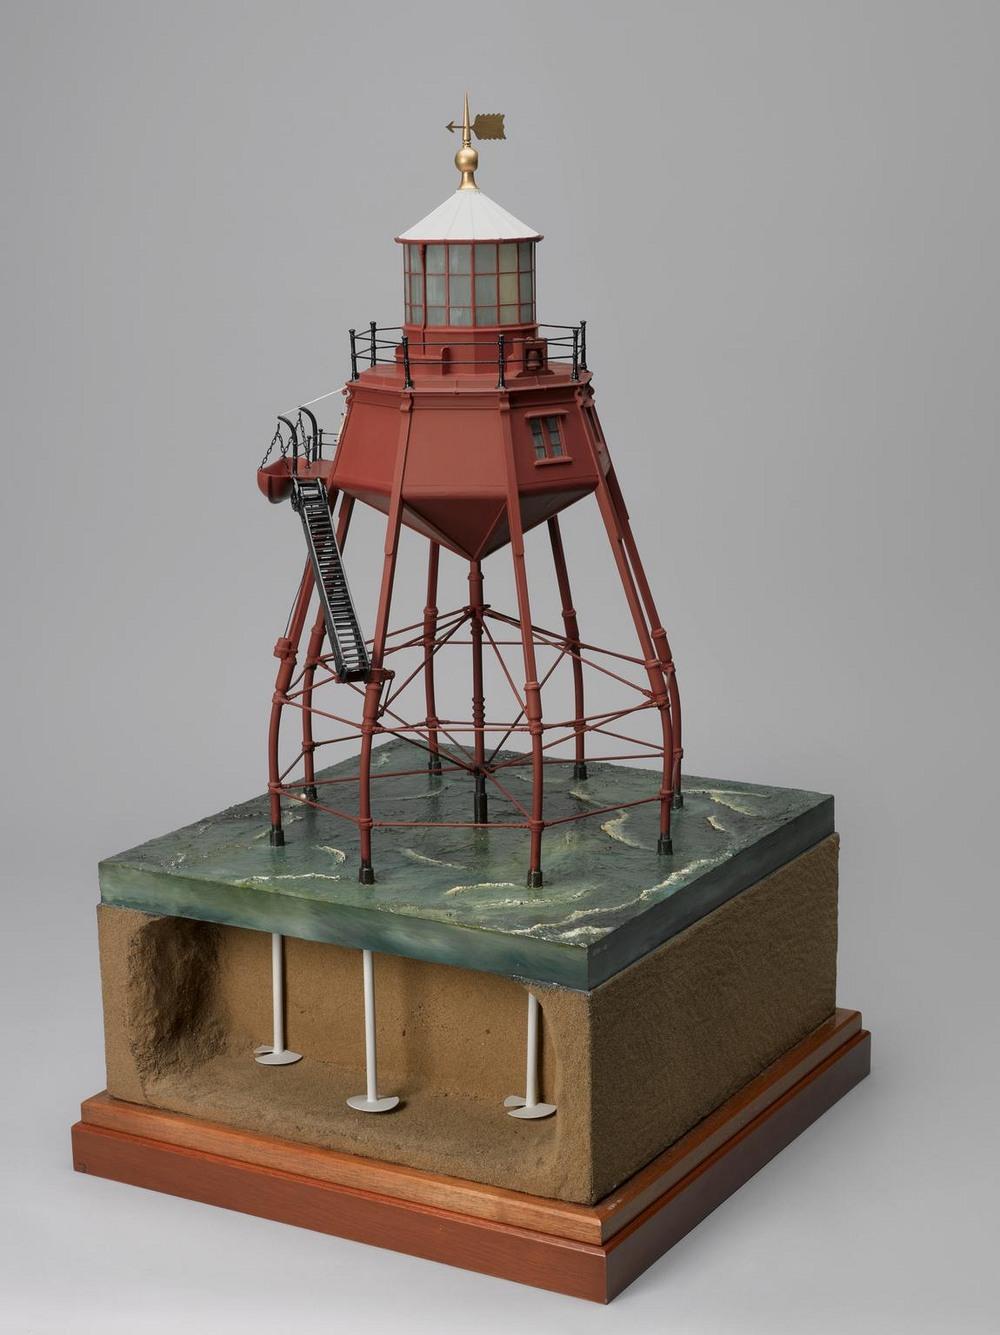 maplin screw pile lighthouse model